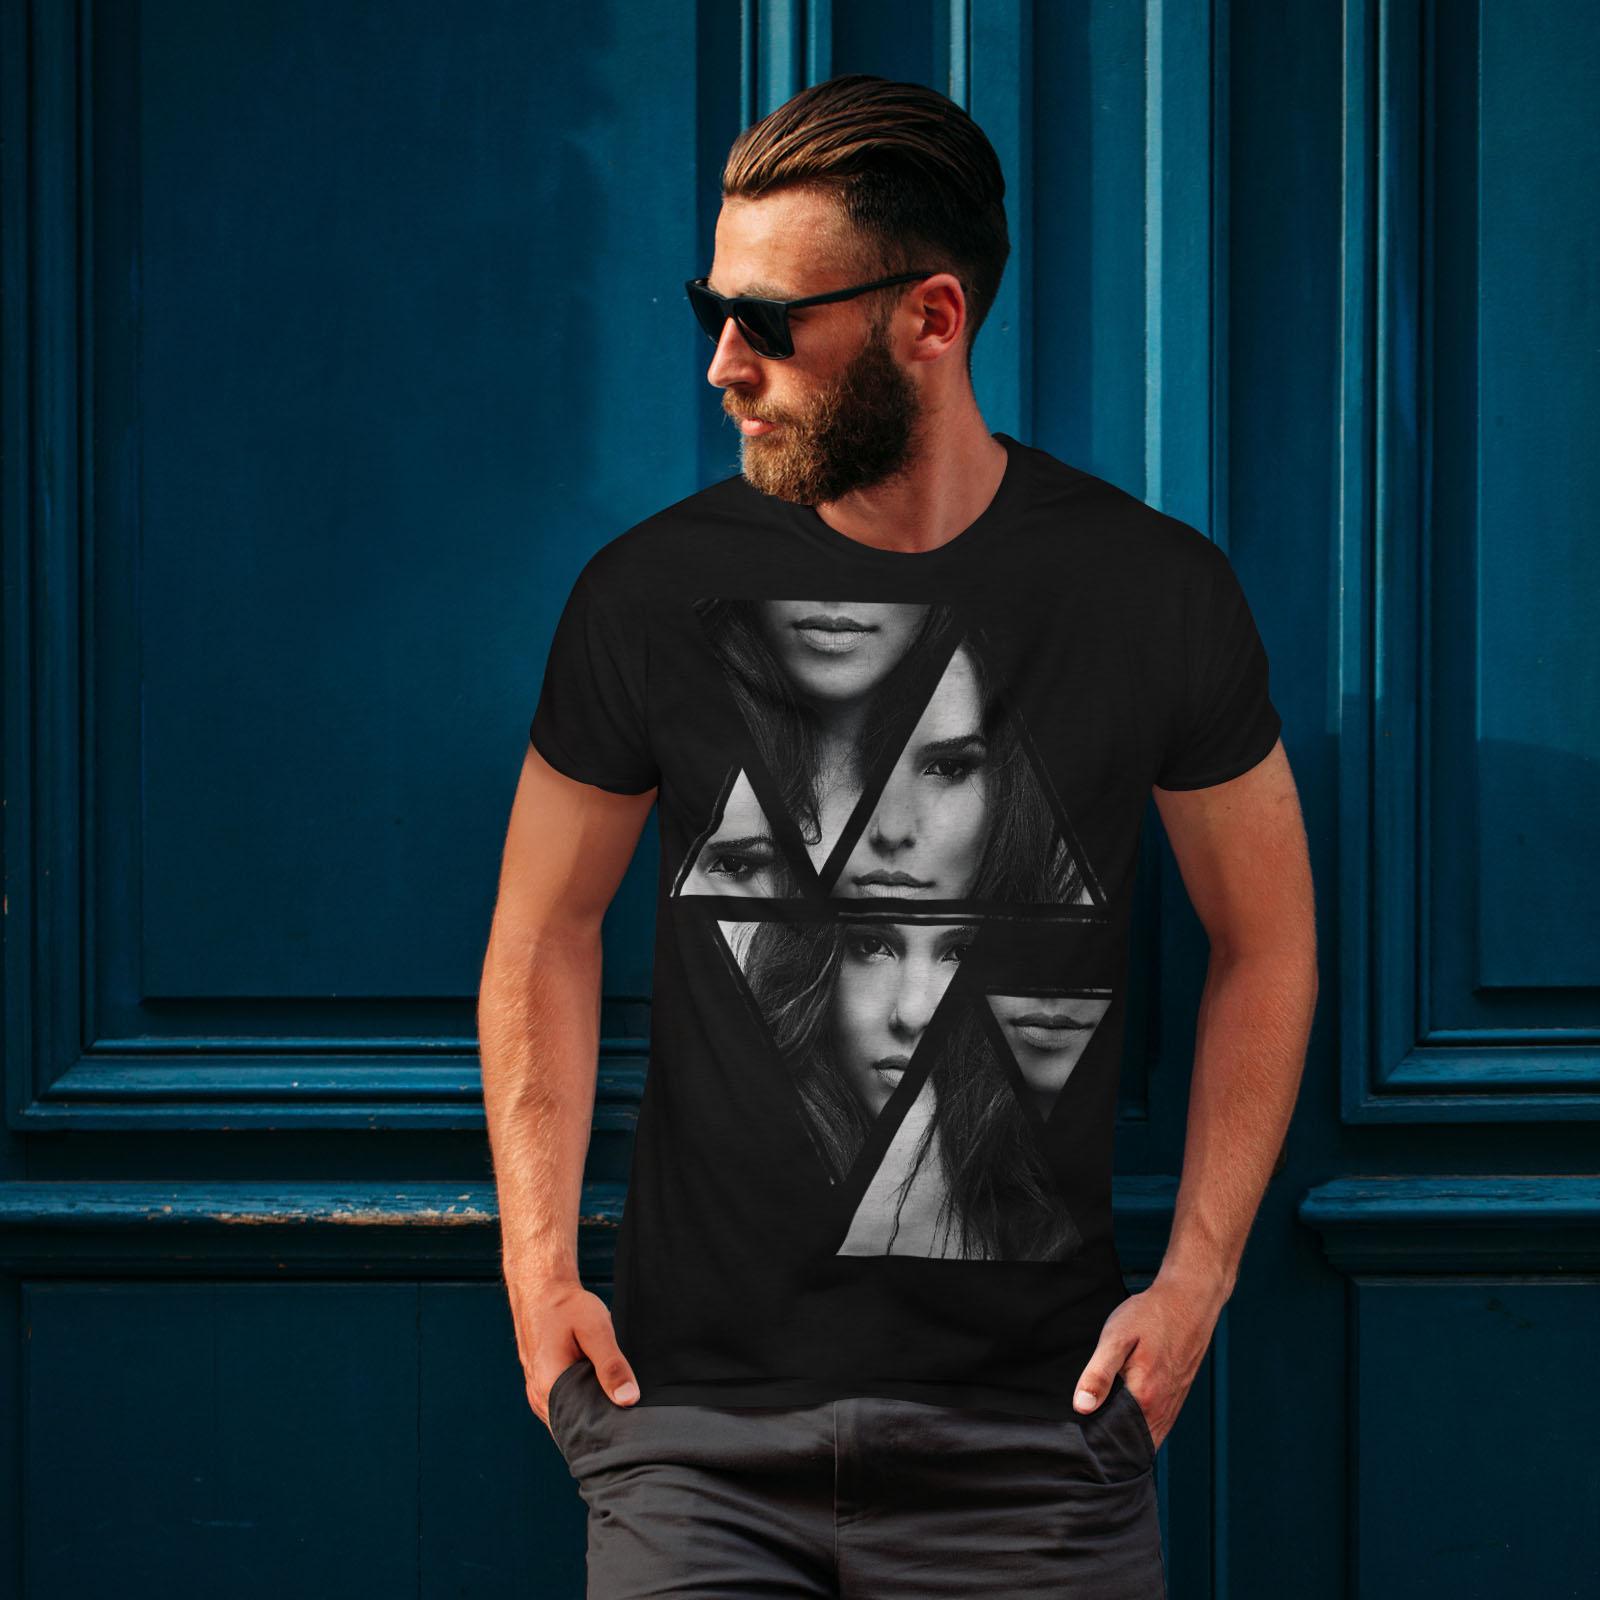 Wellcoda-Art-Fashion-Face-T-shirt-homme-Abstract-Design-graphique-imprime-Tee miniature 4